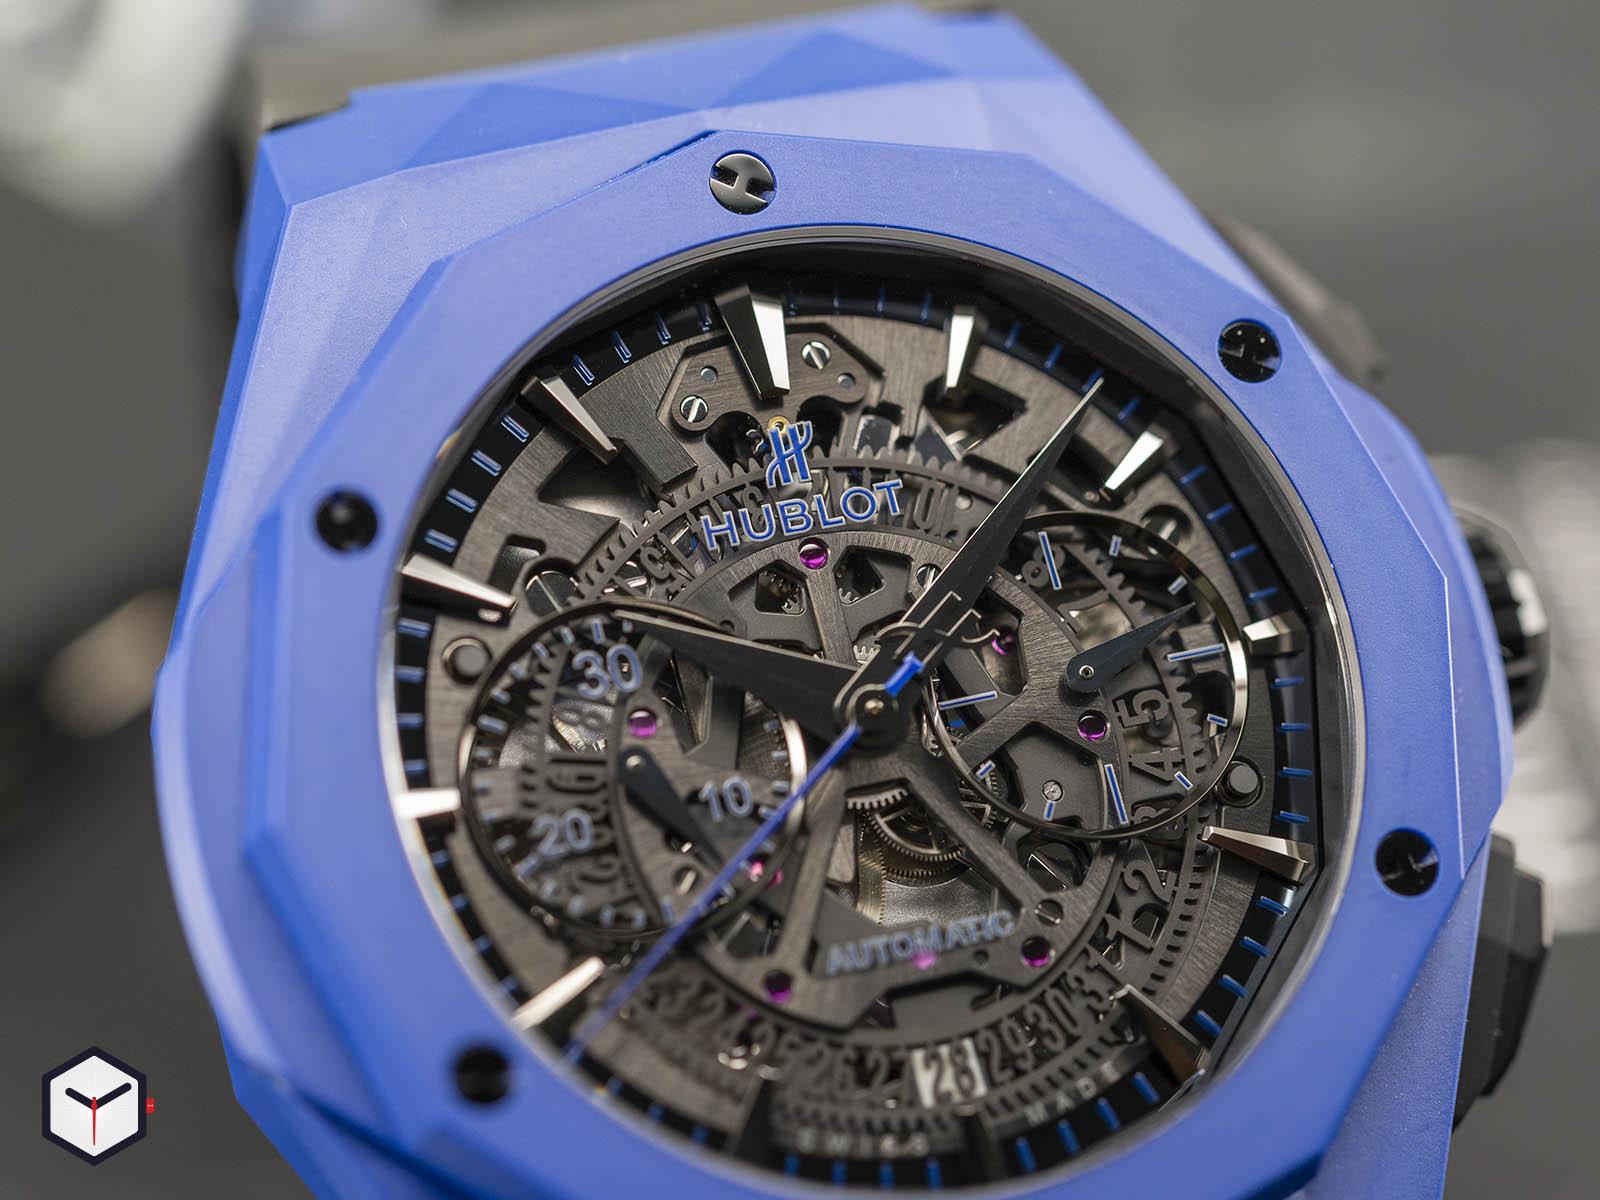 525-ex-0179-rx-orl18-hublot-aerofusion-chronograph-orlinski-blue-ceramic-3.jpg